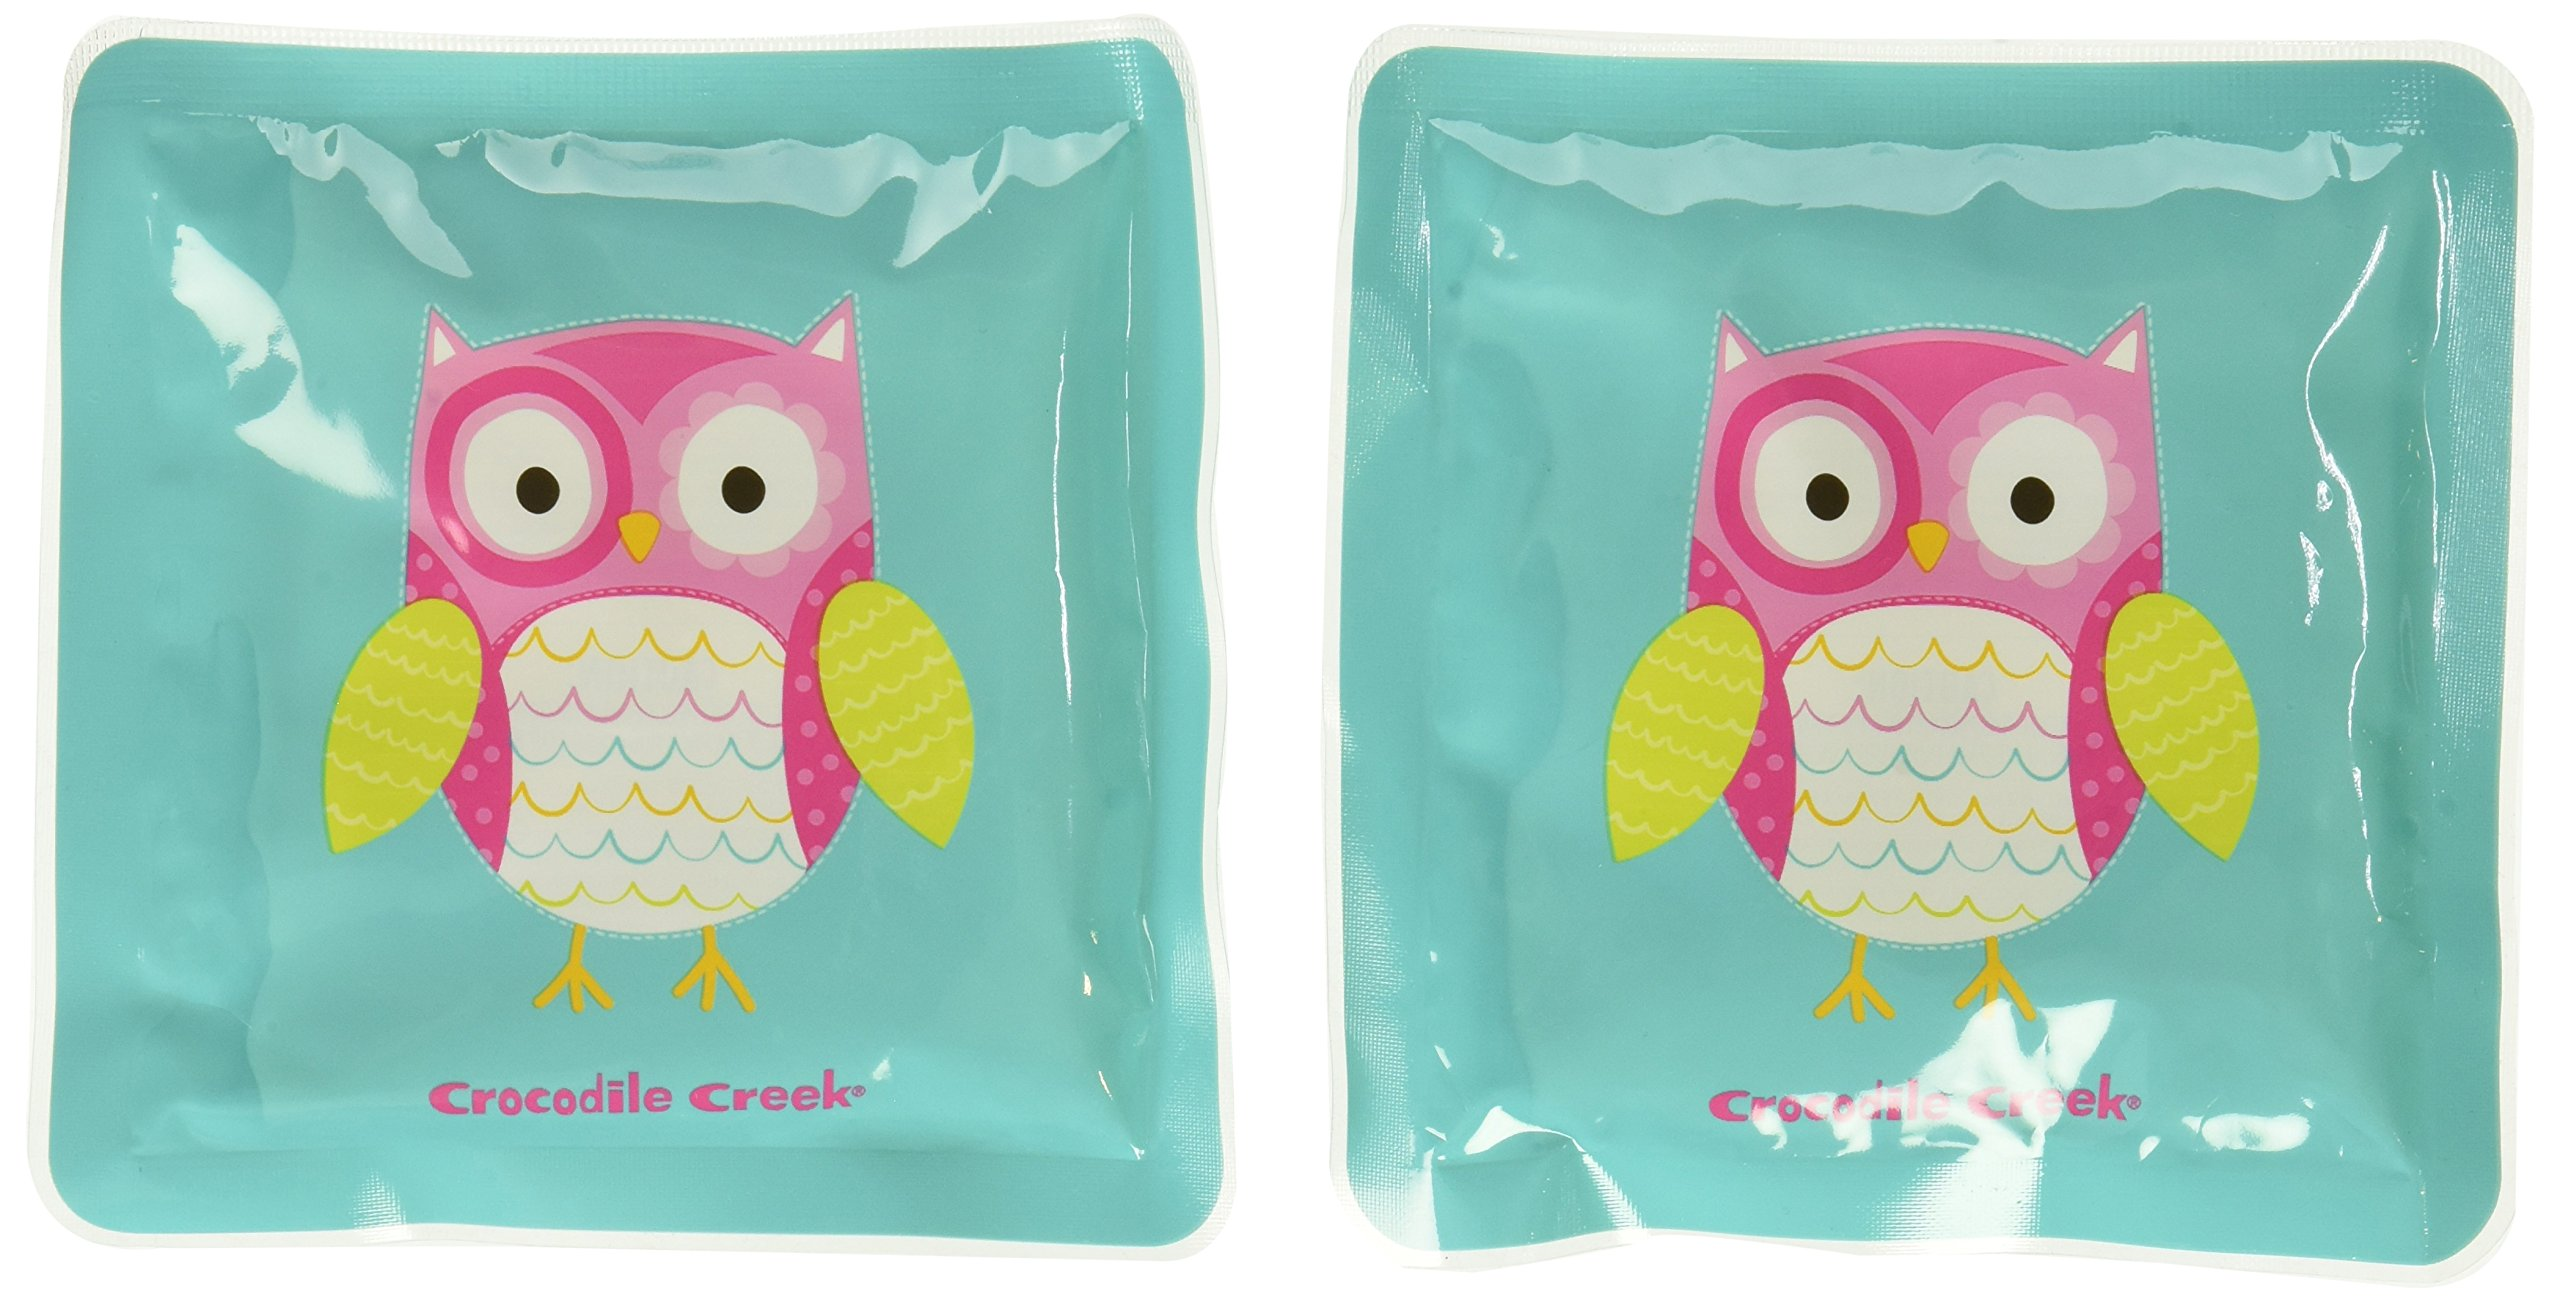 Crocodile Creek Girls Eco Reusable Owl Ice Packs For Lunch Boxes Set Of 2 Teal 5 Buy Online In Belize At Belize Desertcart Com Productid 17616185